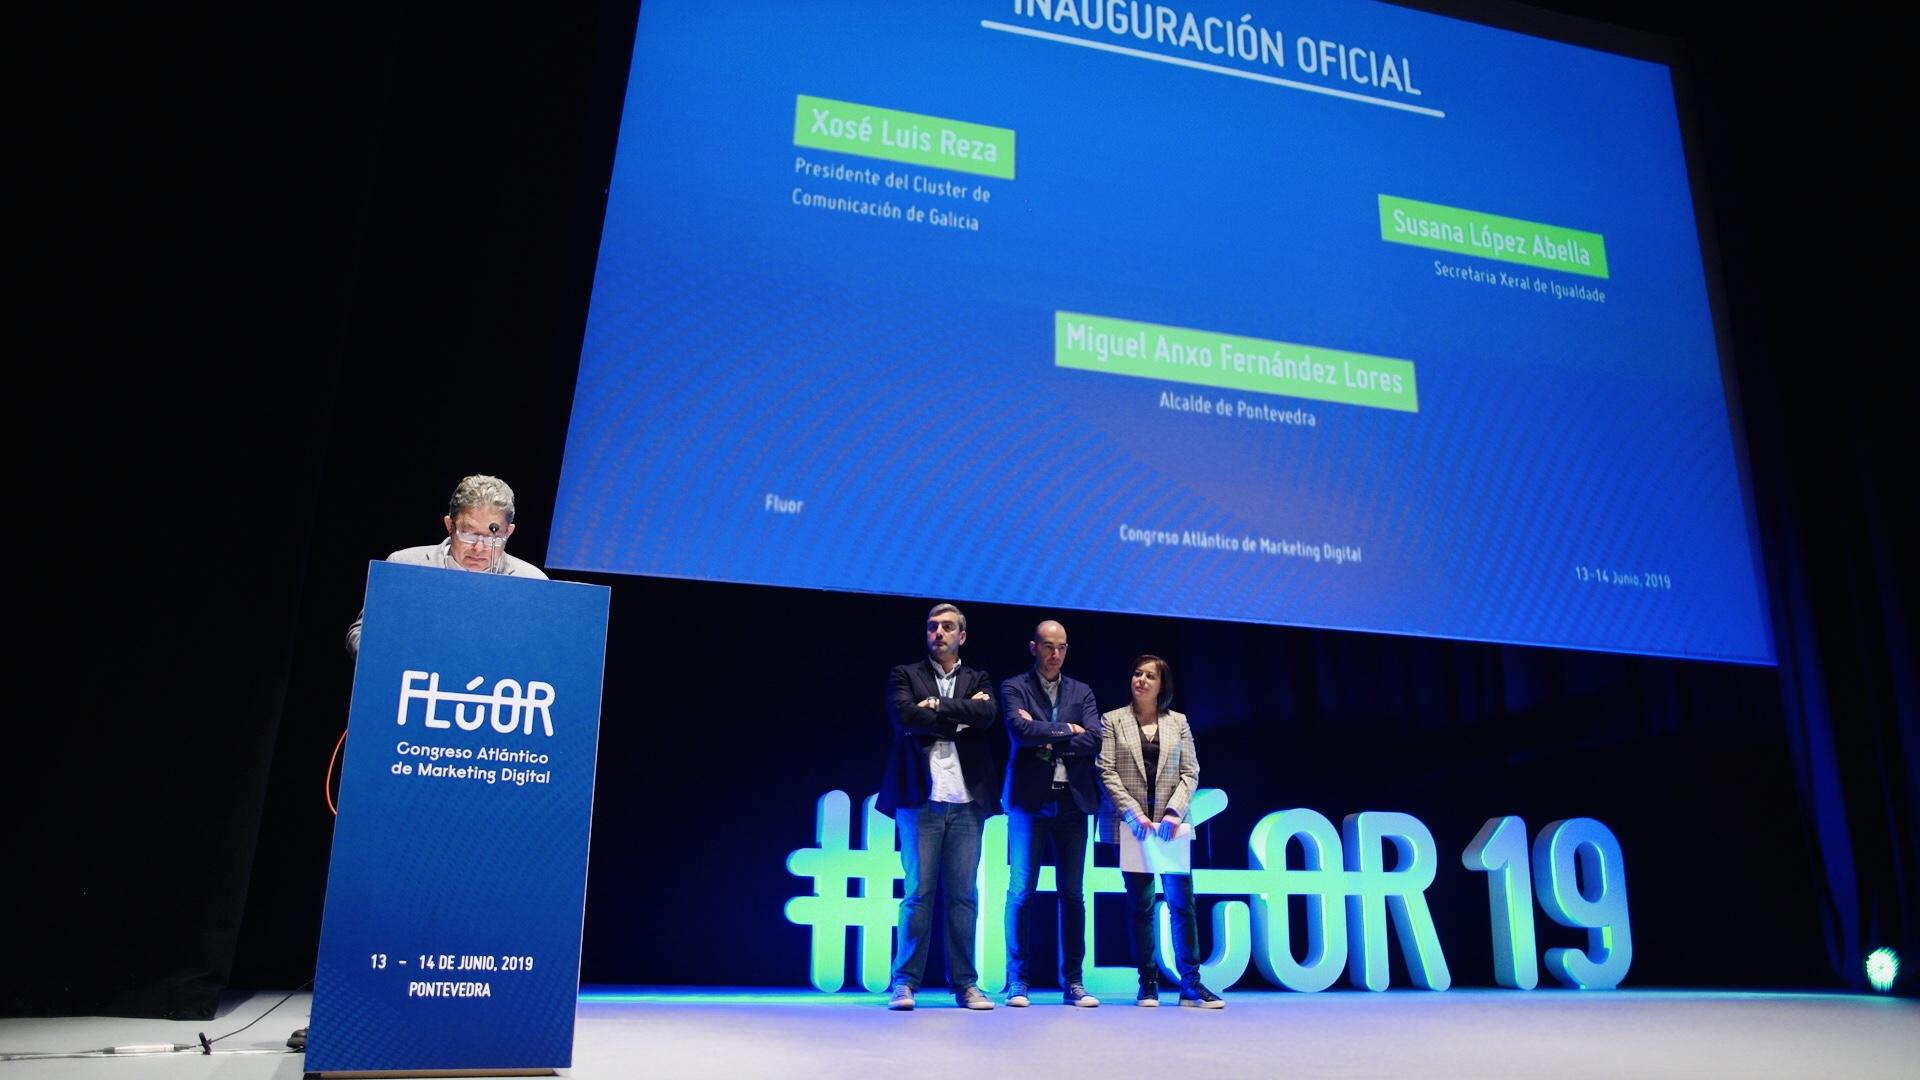 fluor_inauguracion